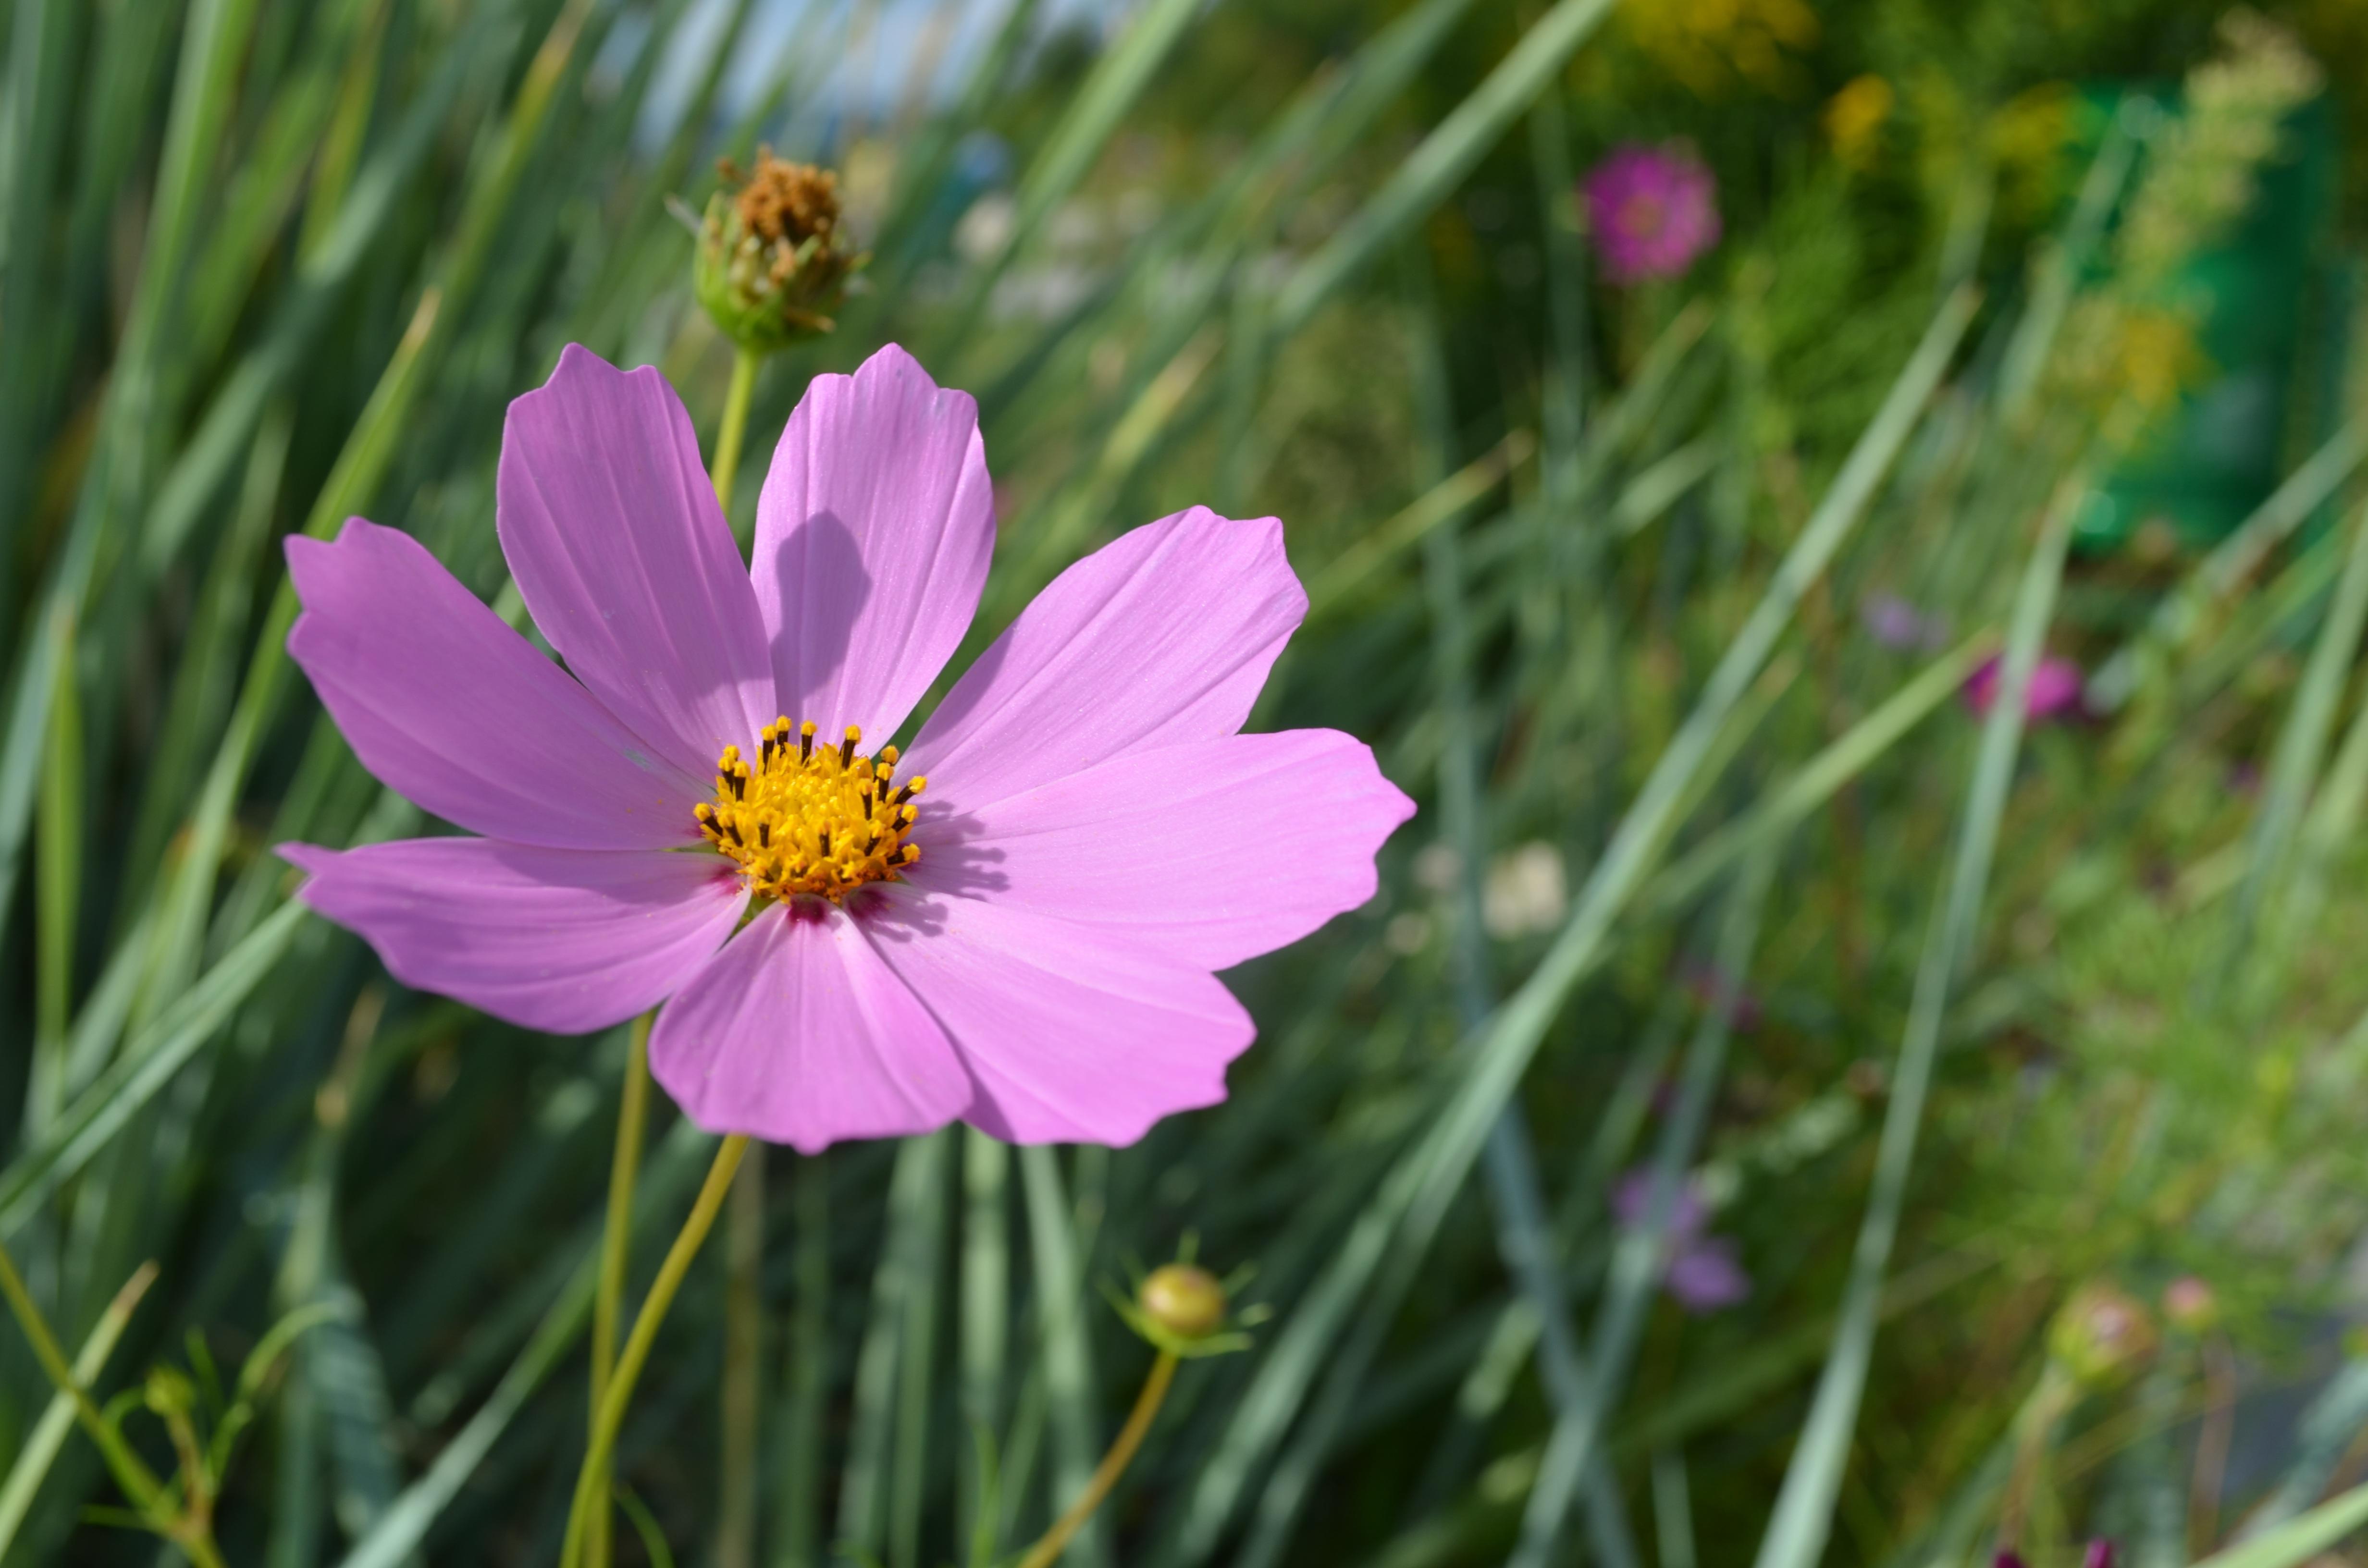 Free Images : nature, grass, field, meadow, prairie, flower, petal ...